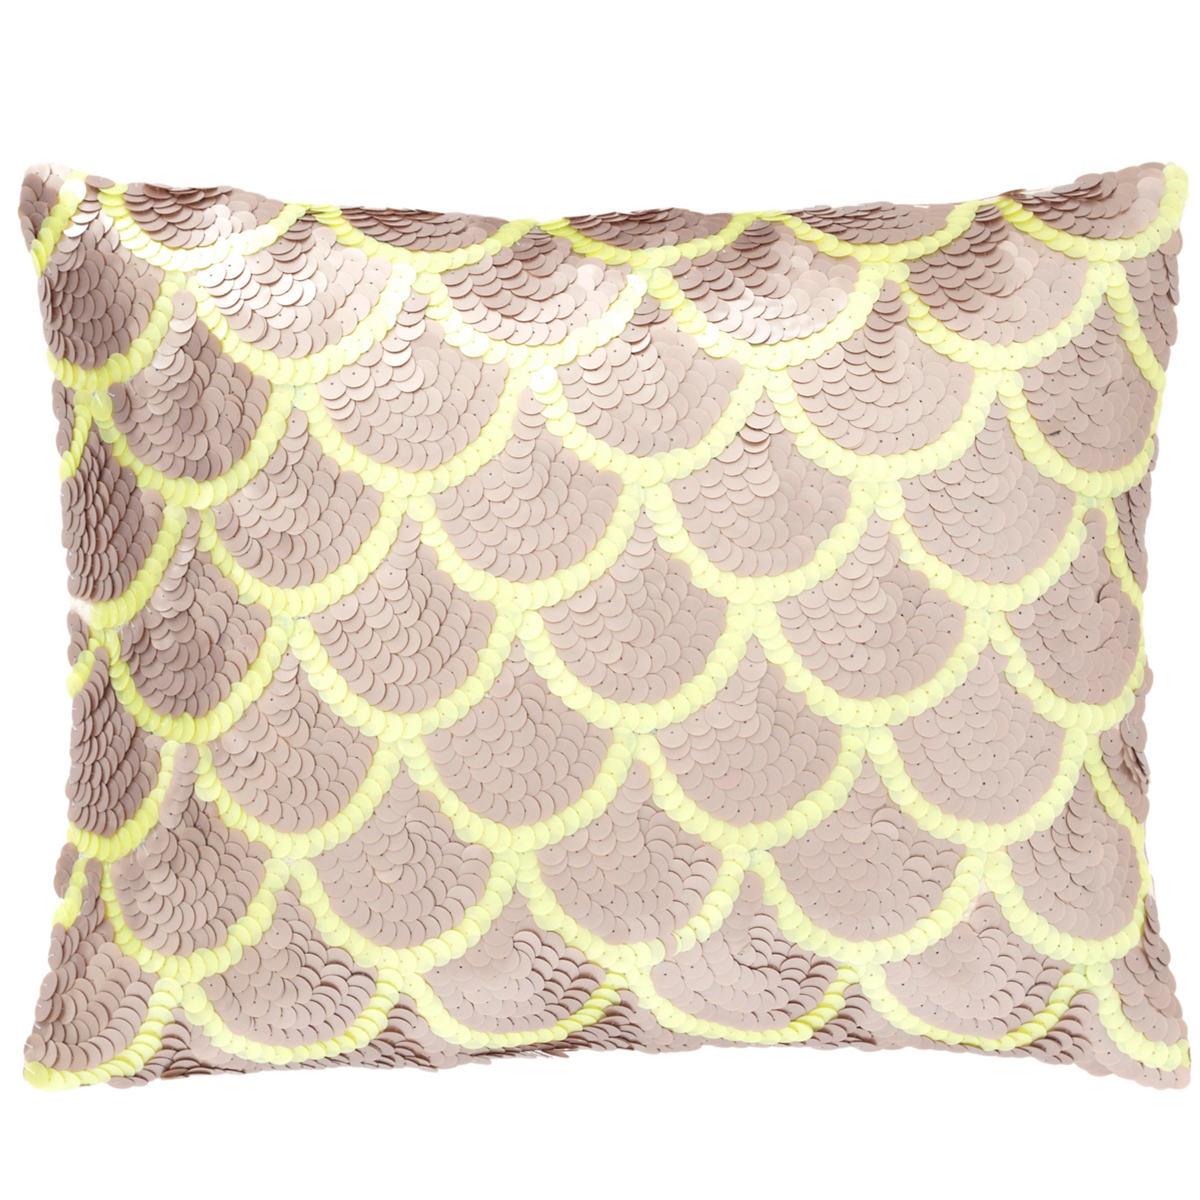 Snapper Green Decorative Pillow